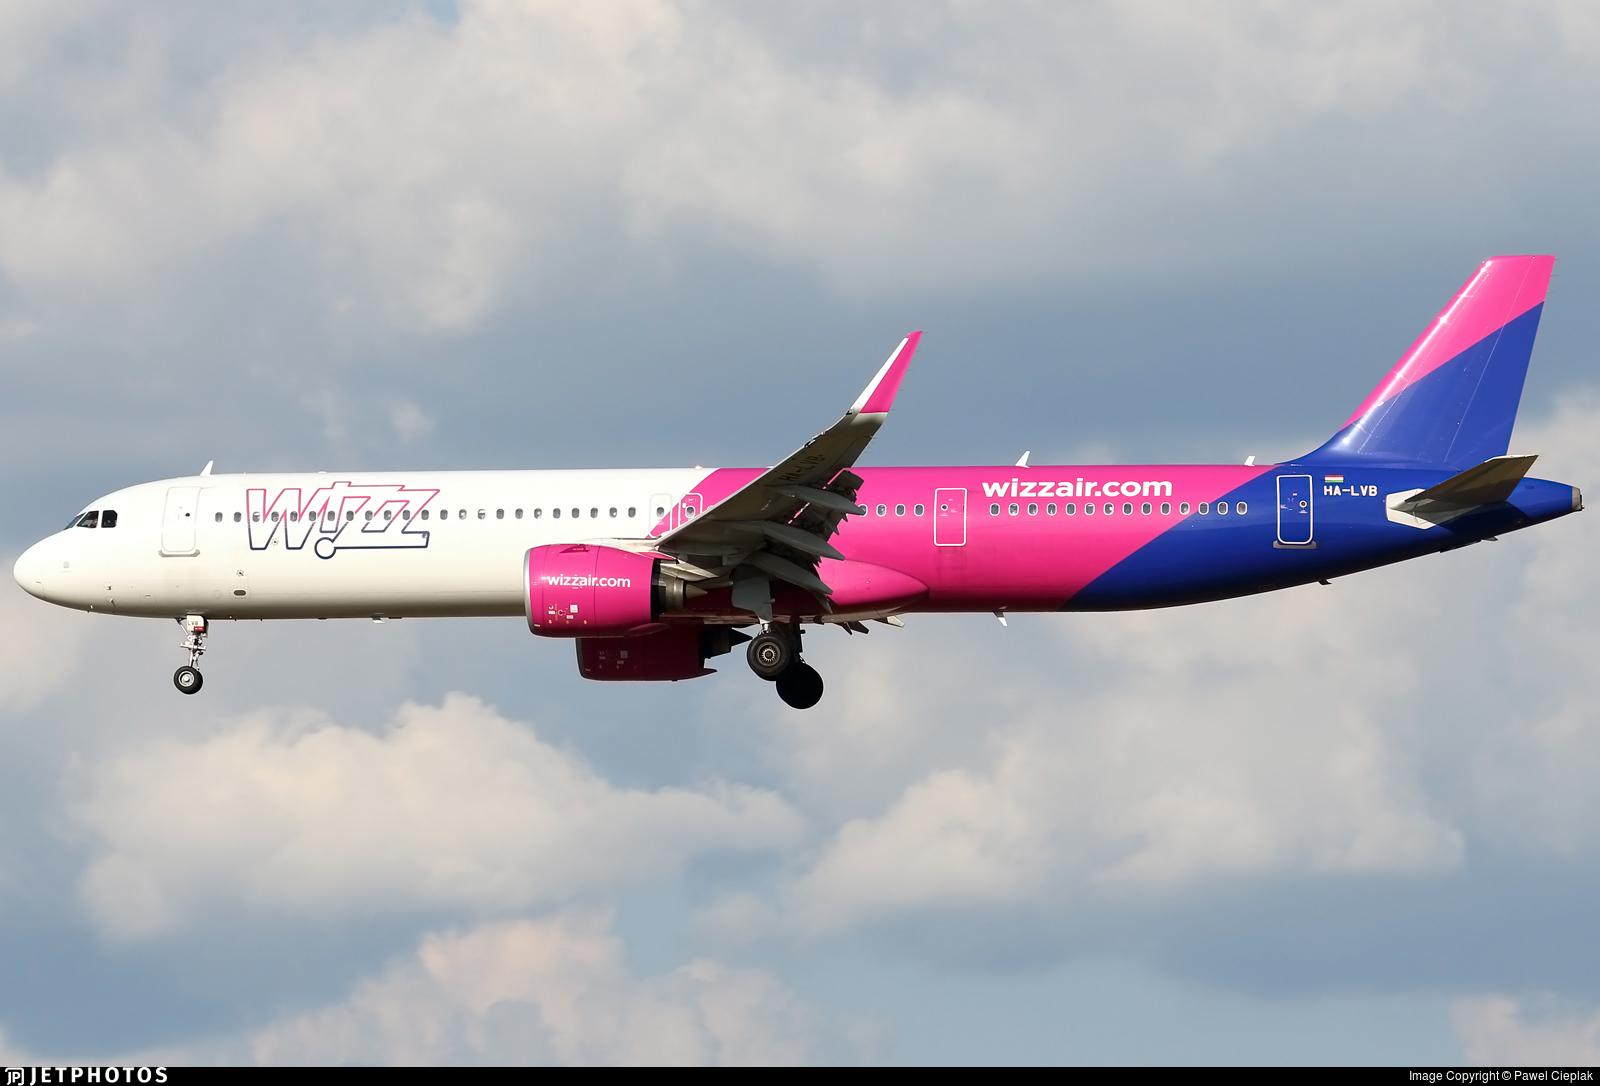 Ha Lvb Airbus A321 271nx Wizz Air Pawel Cieplak Jetphotos